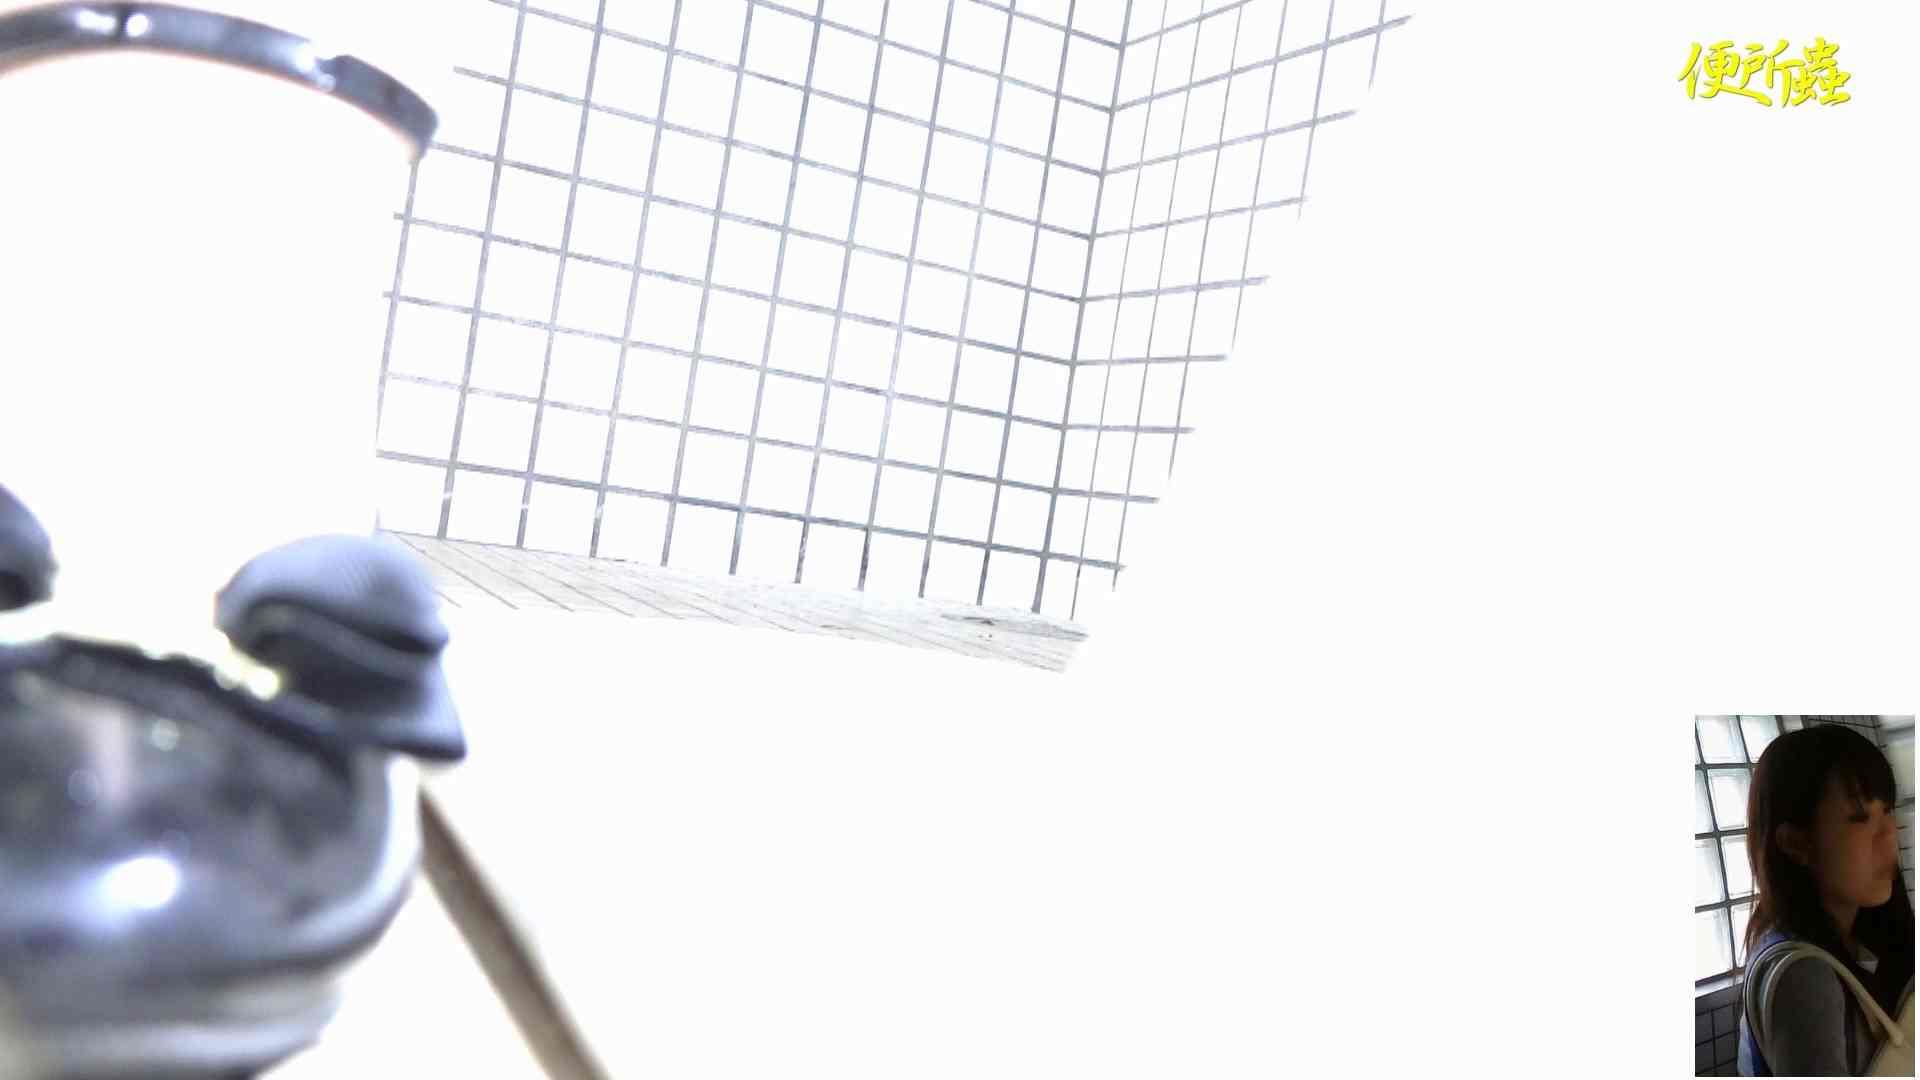 vol.01 便所蟲さんのリターン~便所蟲2匹目~ ギャルズ 濡れ場動画紹介 79画像 22